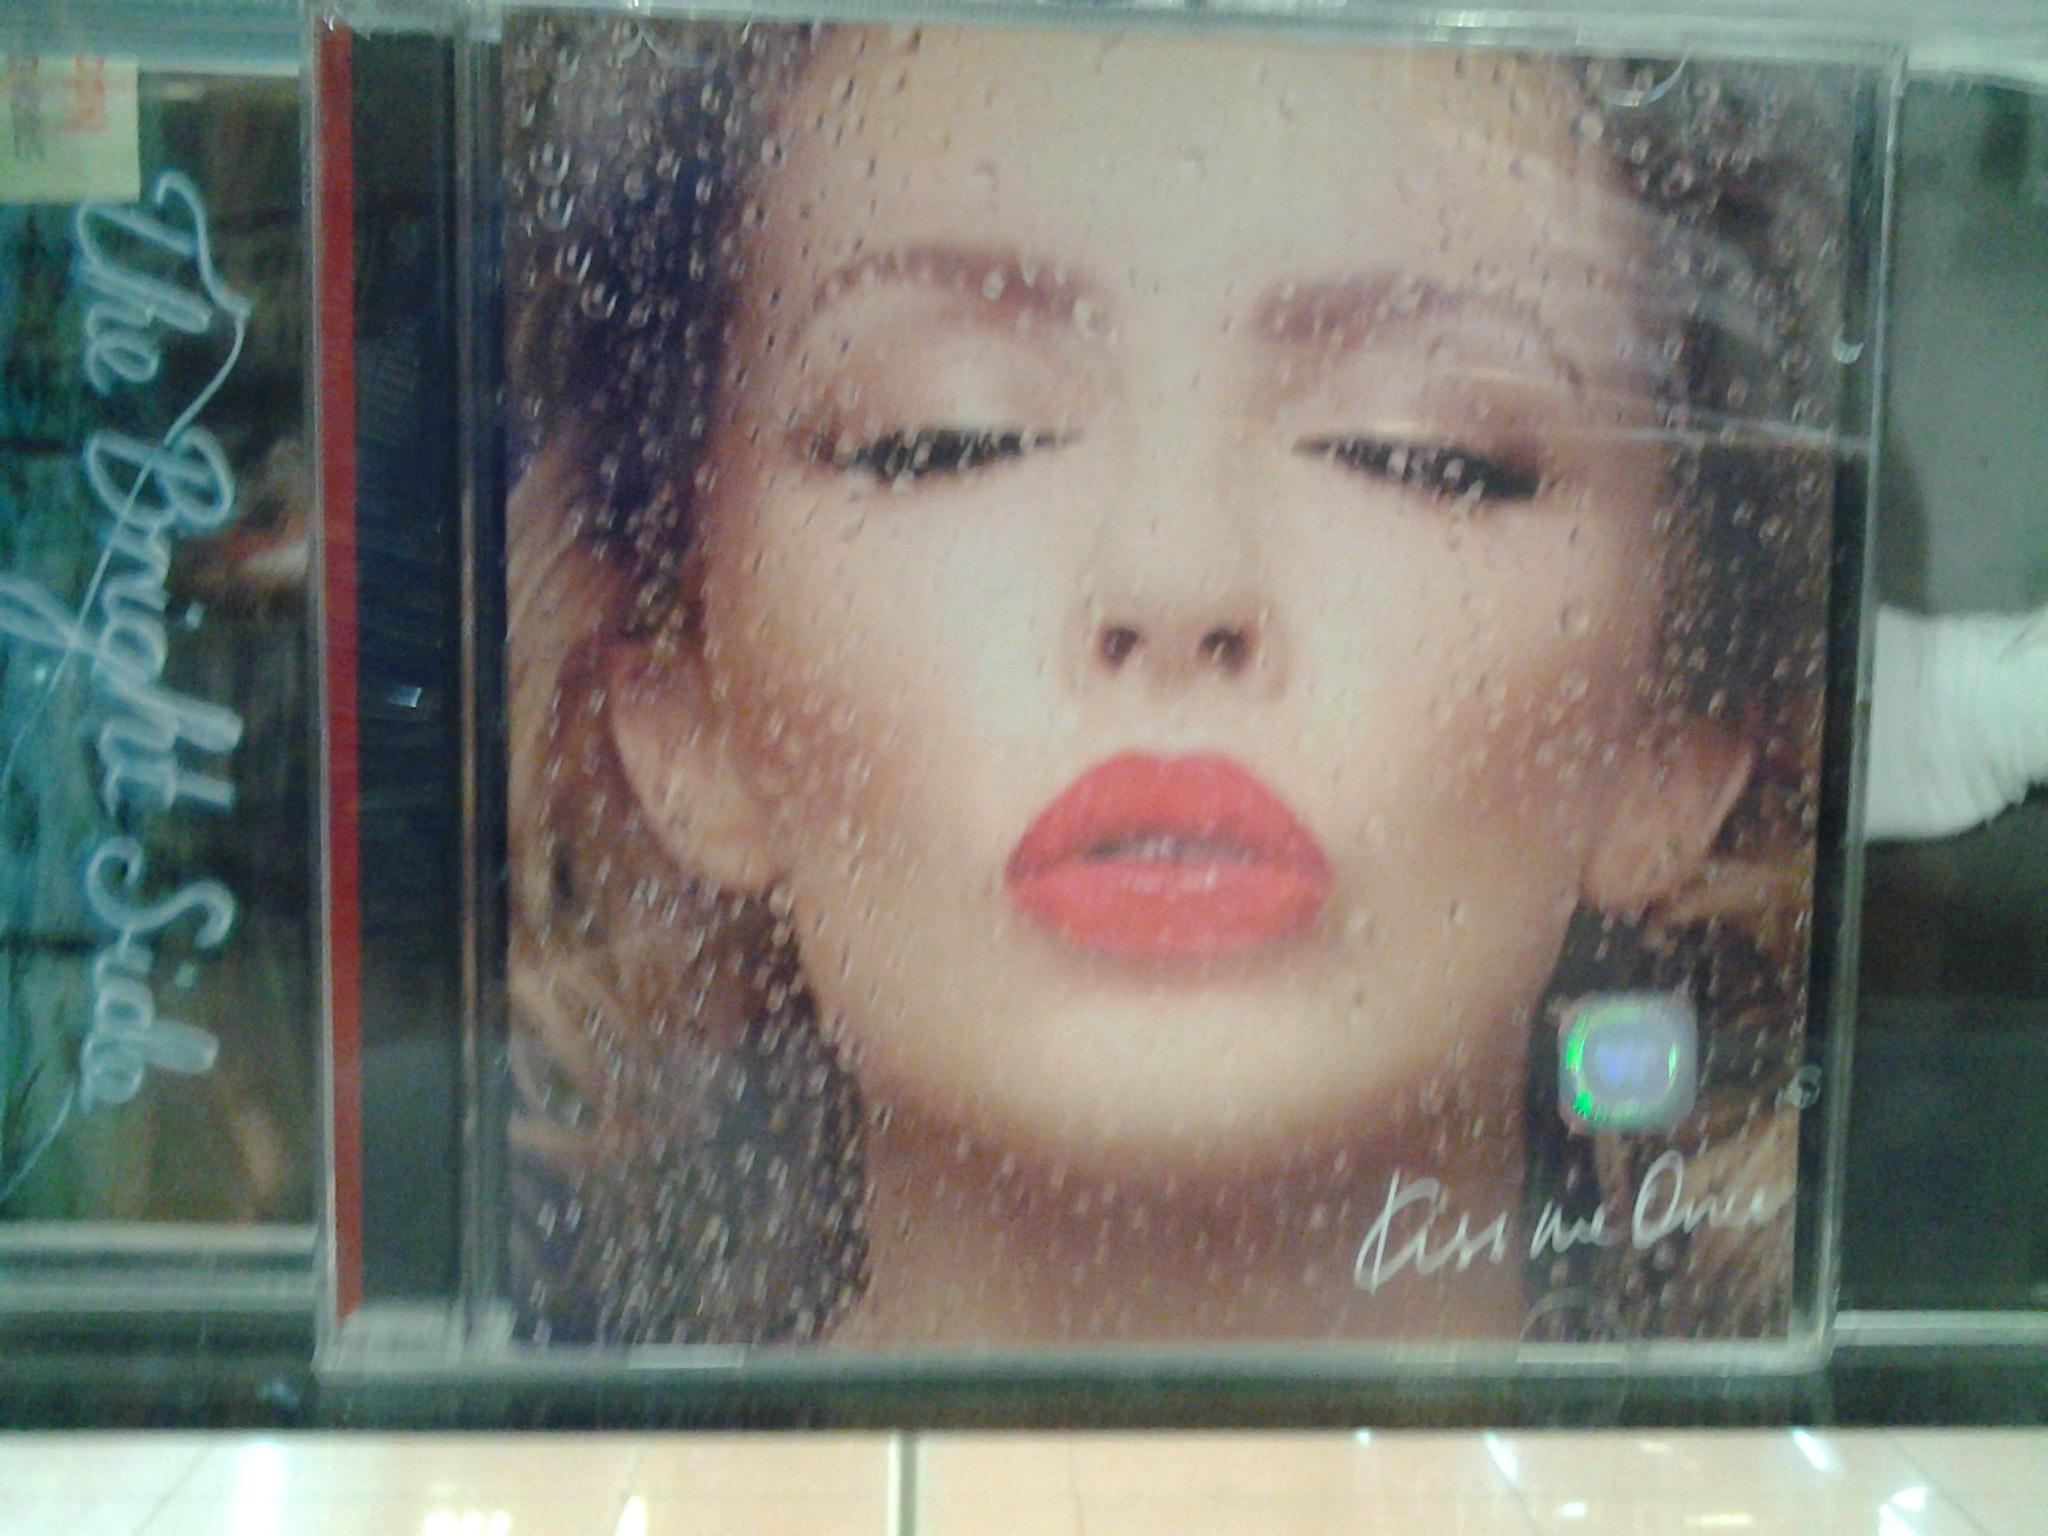 harga CD KYLIE MINOGUE - KISS ME ONCE RP.85.000 Tokopedia.com